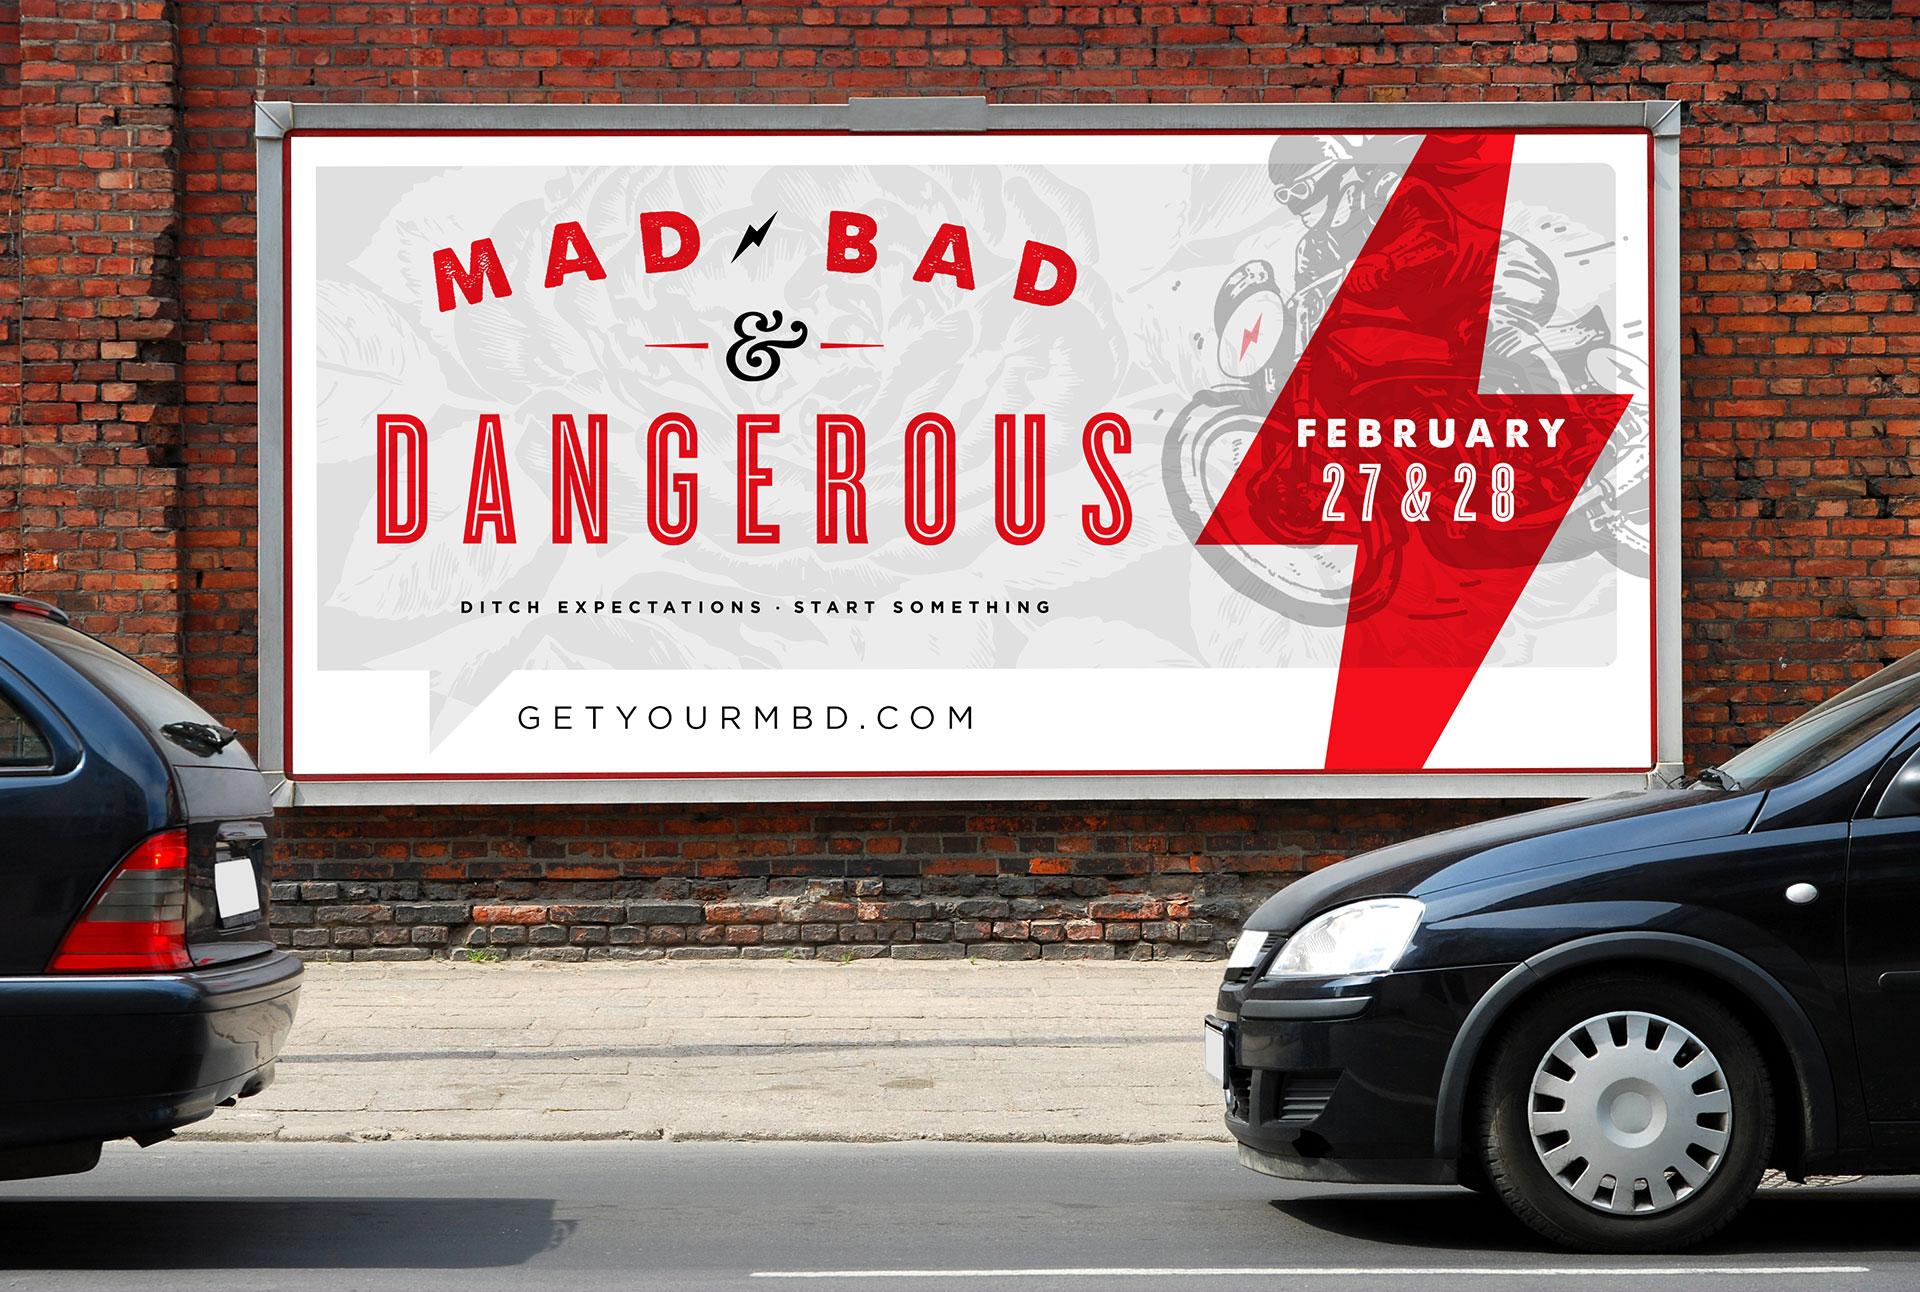 Mad, Bad, & Dangerous - Billboard, Signage, Branding, Identity, Brand Assets